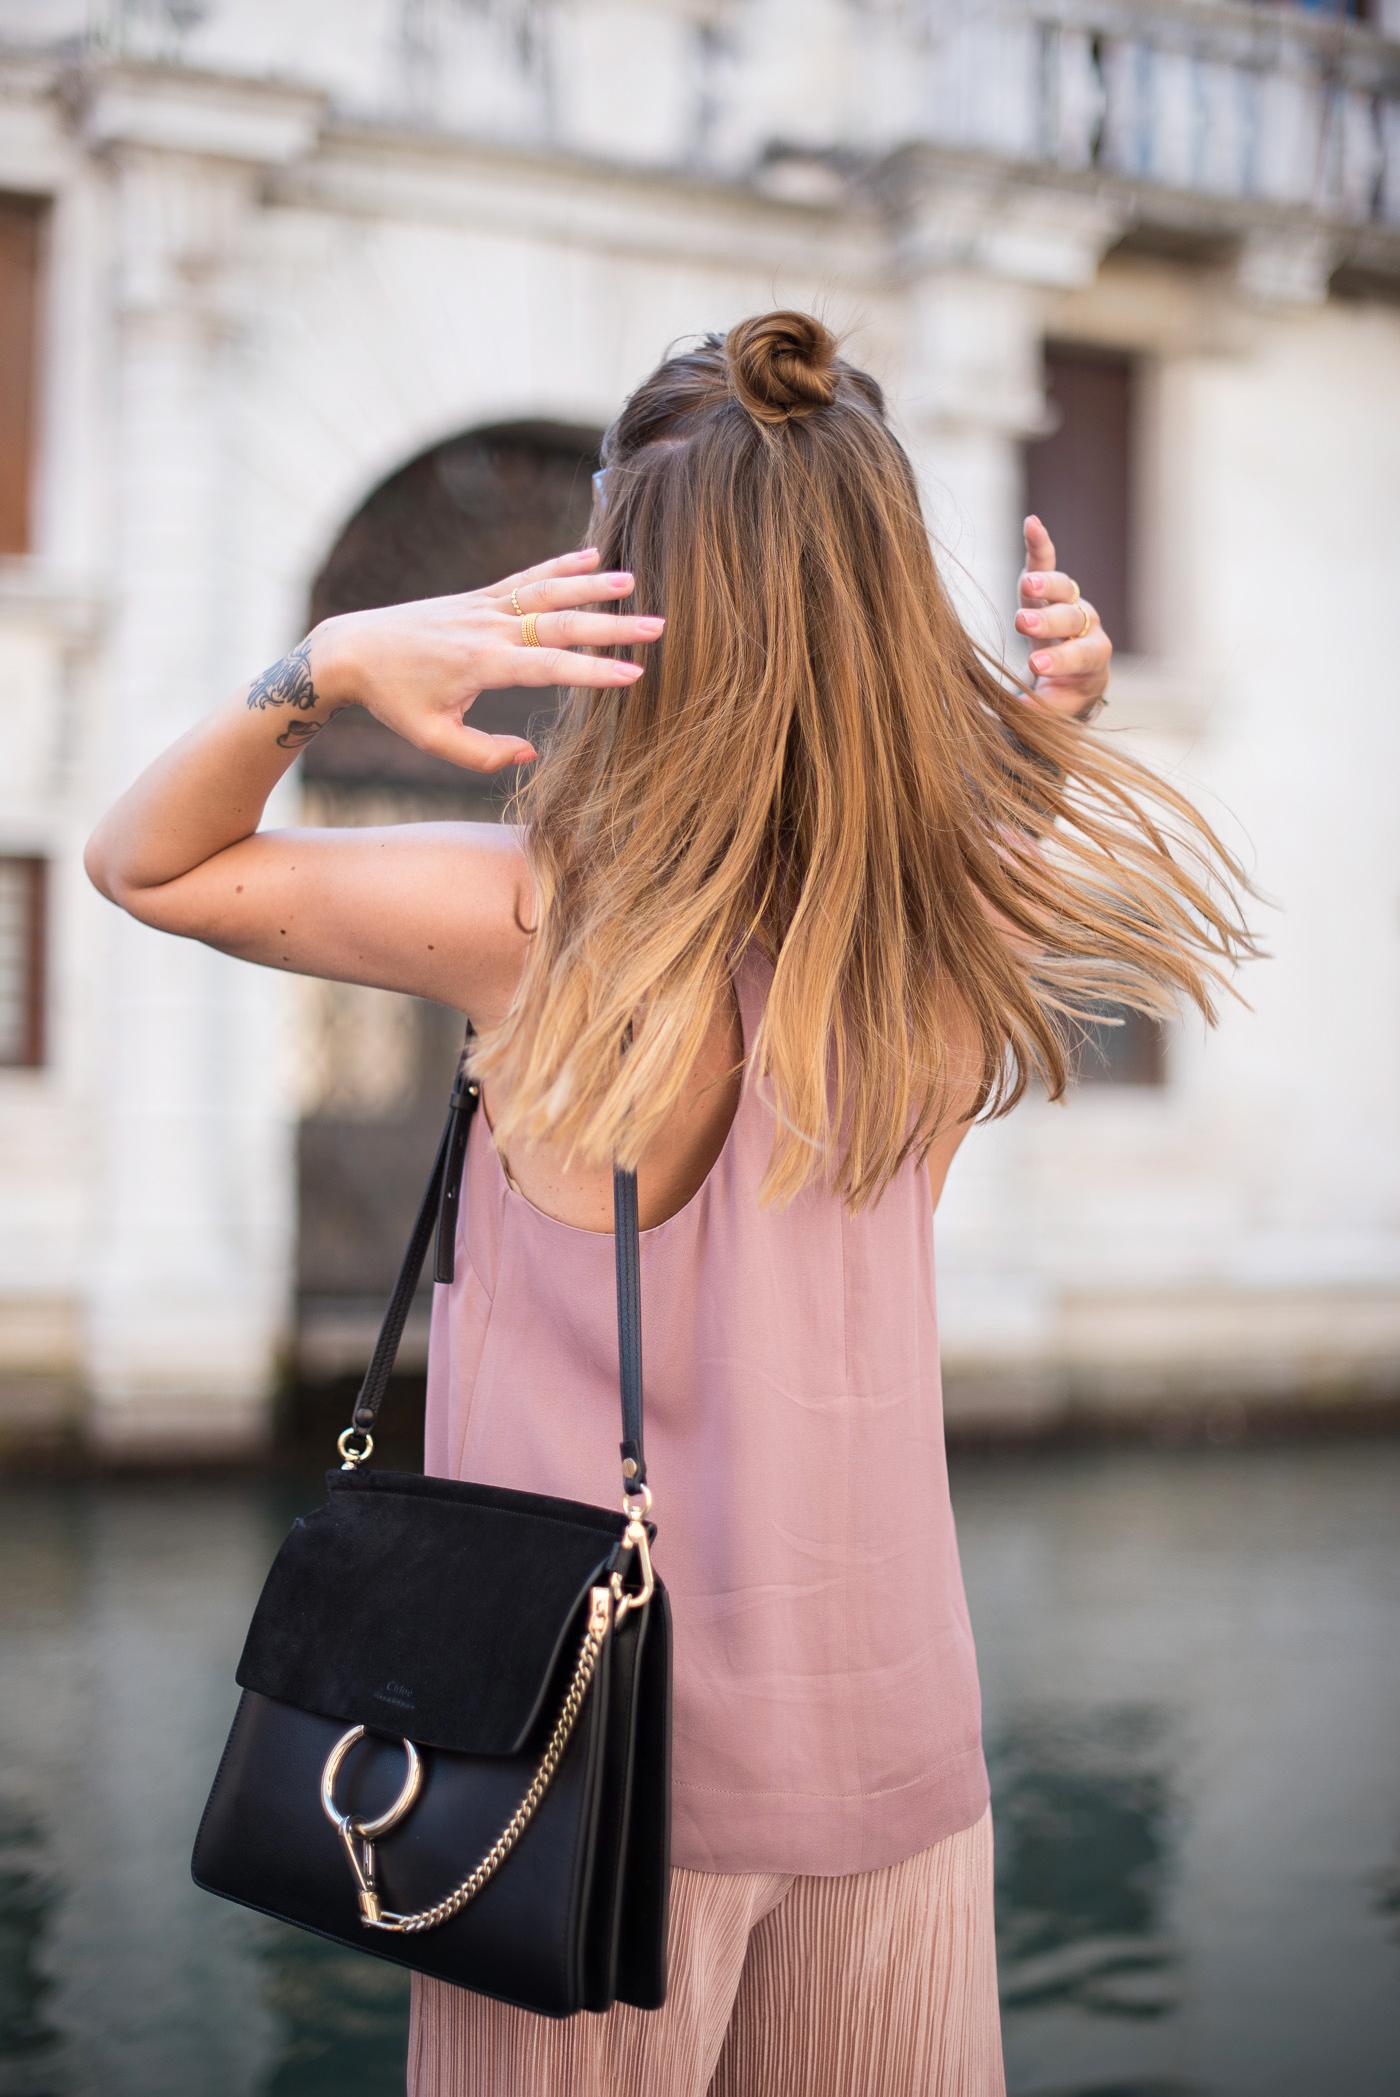 Candy_colors_culotte_outfit_in_Venezia_7